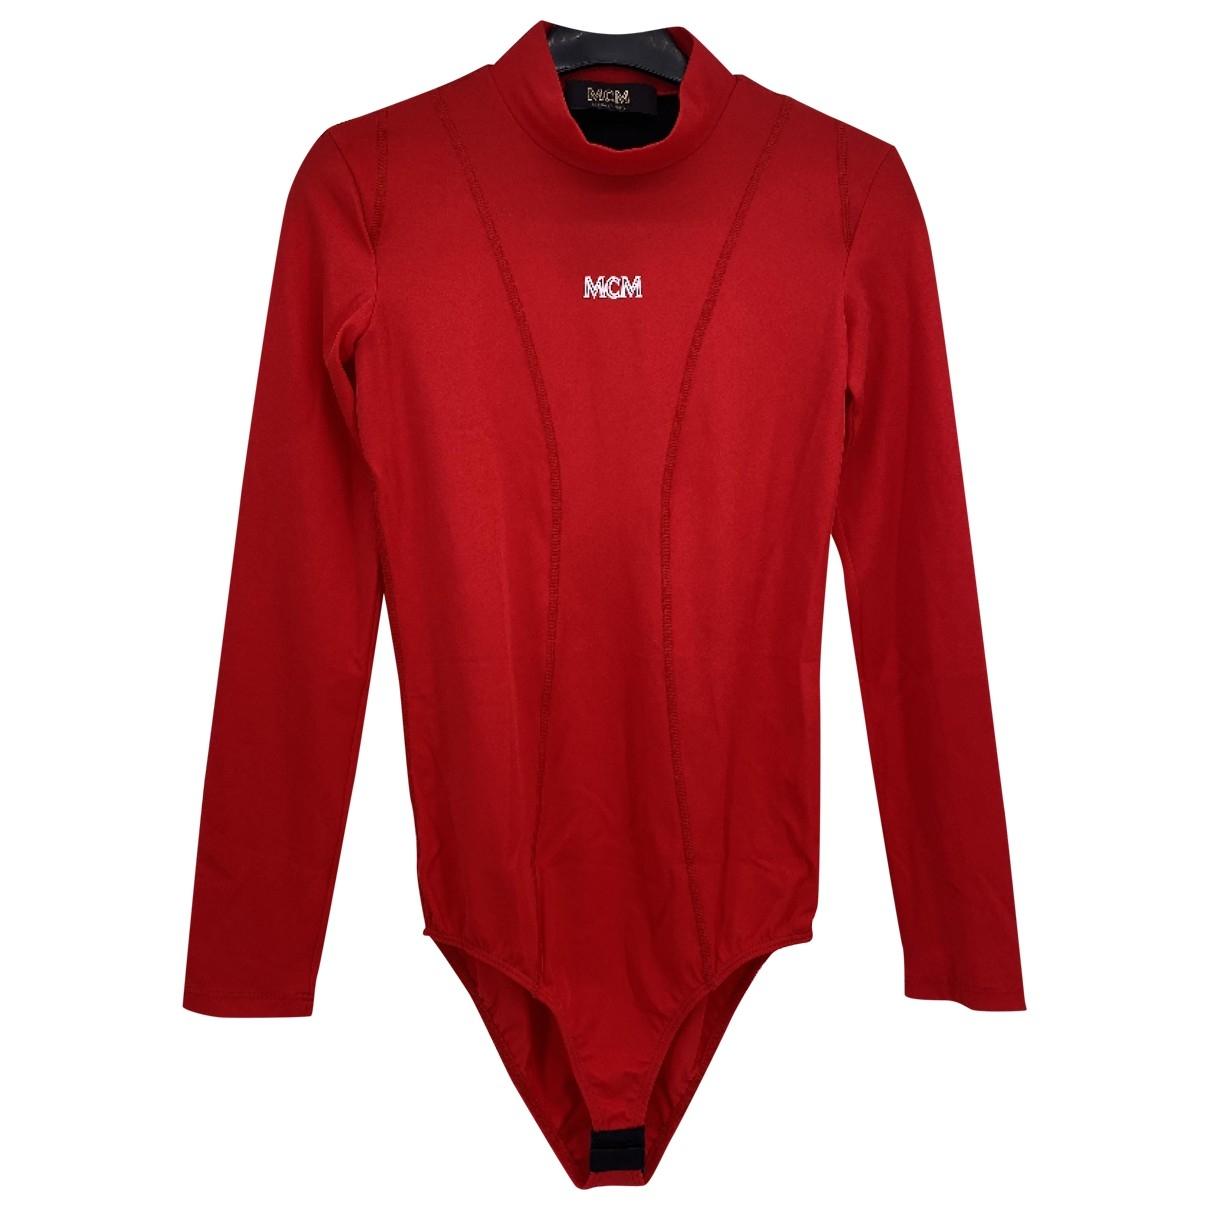 Mcm \N Red Swimwear for Women S International